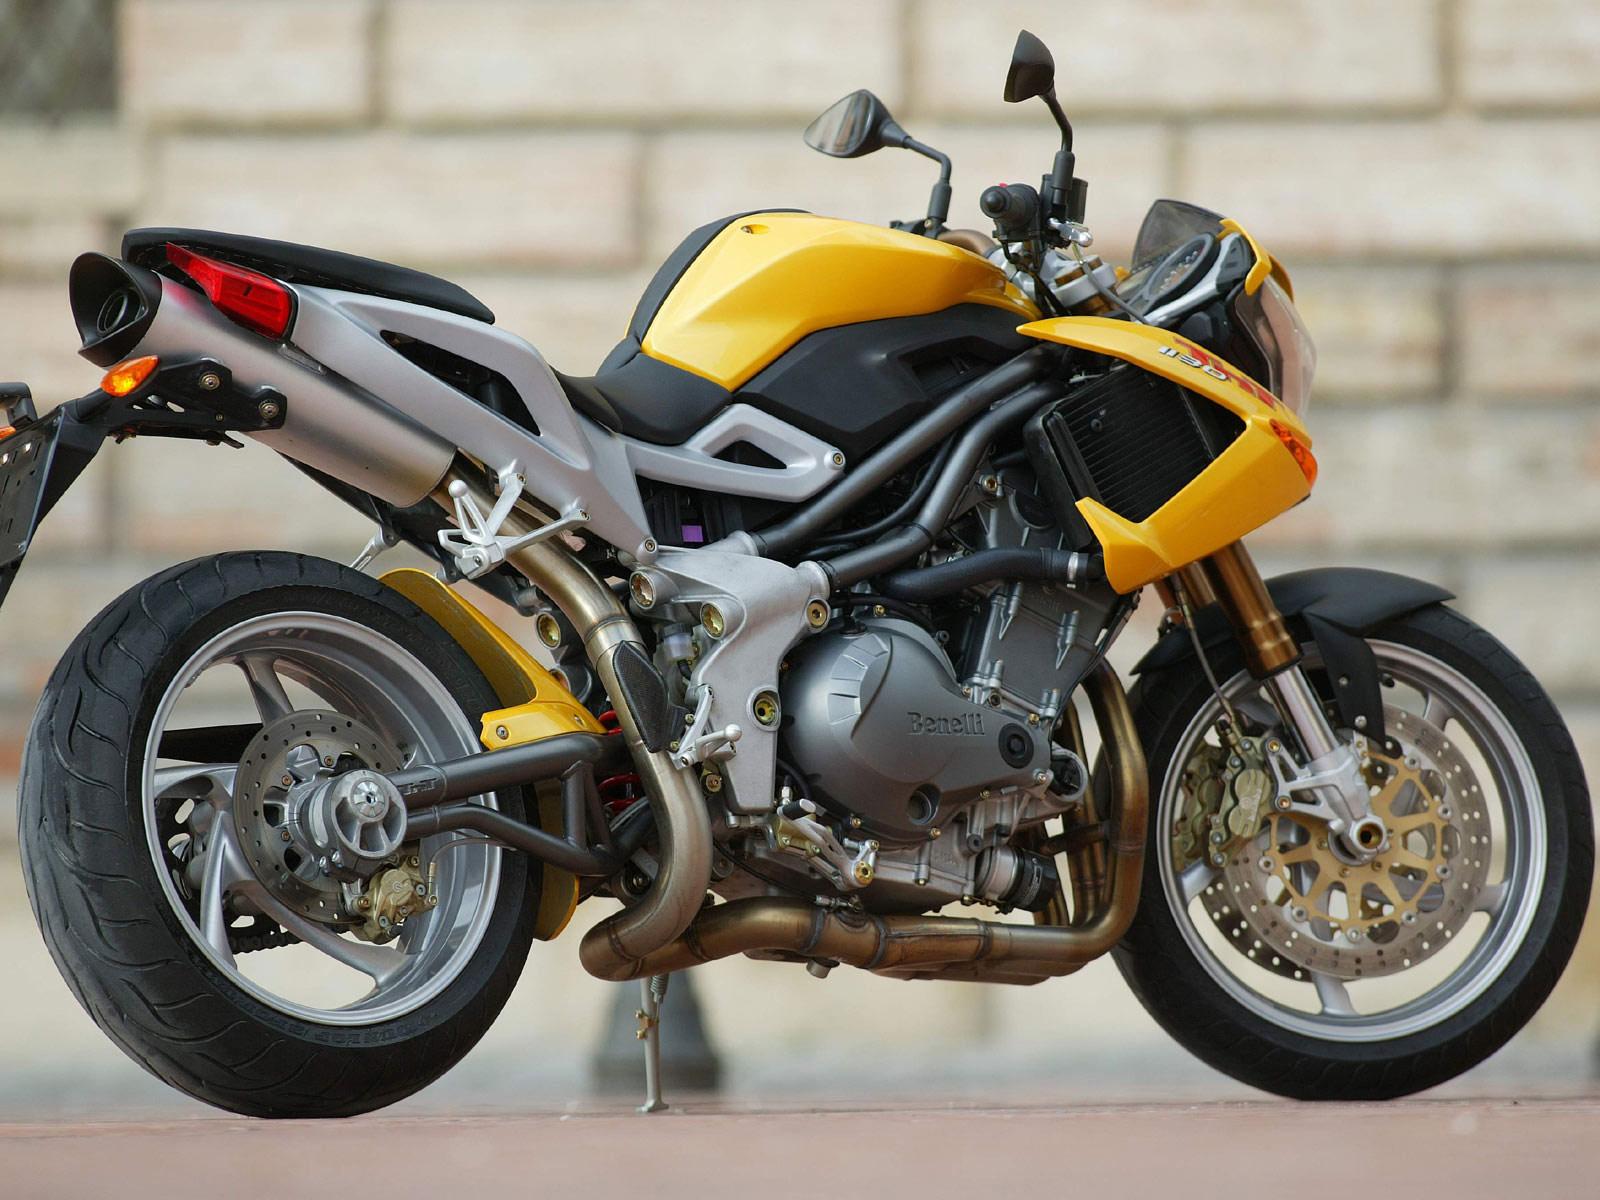 http://2.bp.blogspot.com/-3XfuFk_888c/Tr29FKU_dcI/AAAAAAAADyA/9i-m2Ixgof0/s1600/2005_Benelli-TNT-1130_motorcycle-desktop-wallpaper_15.jpg